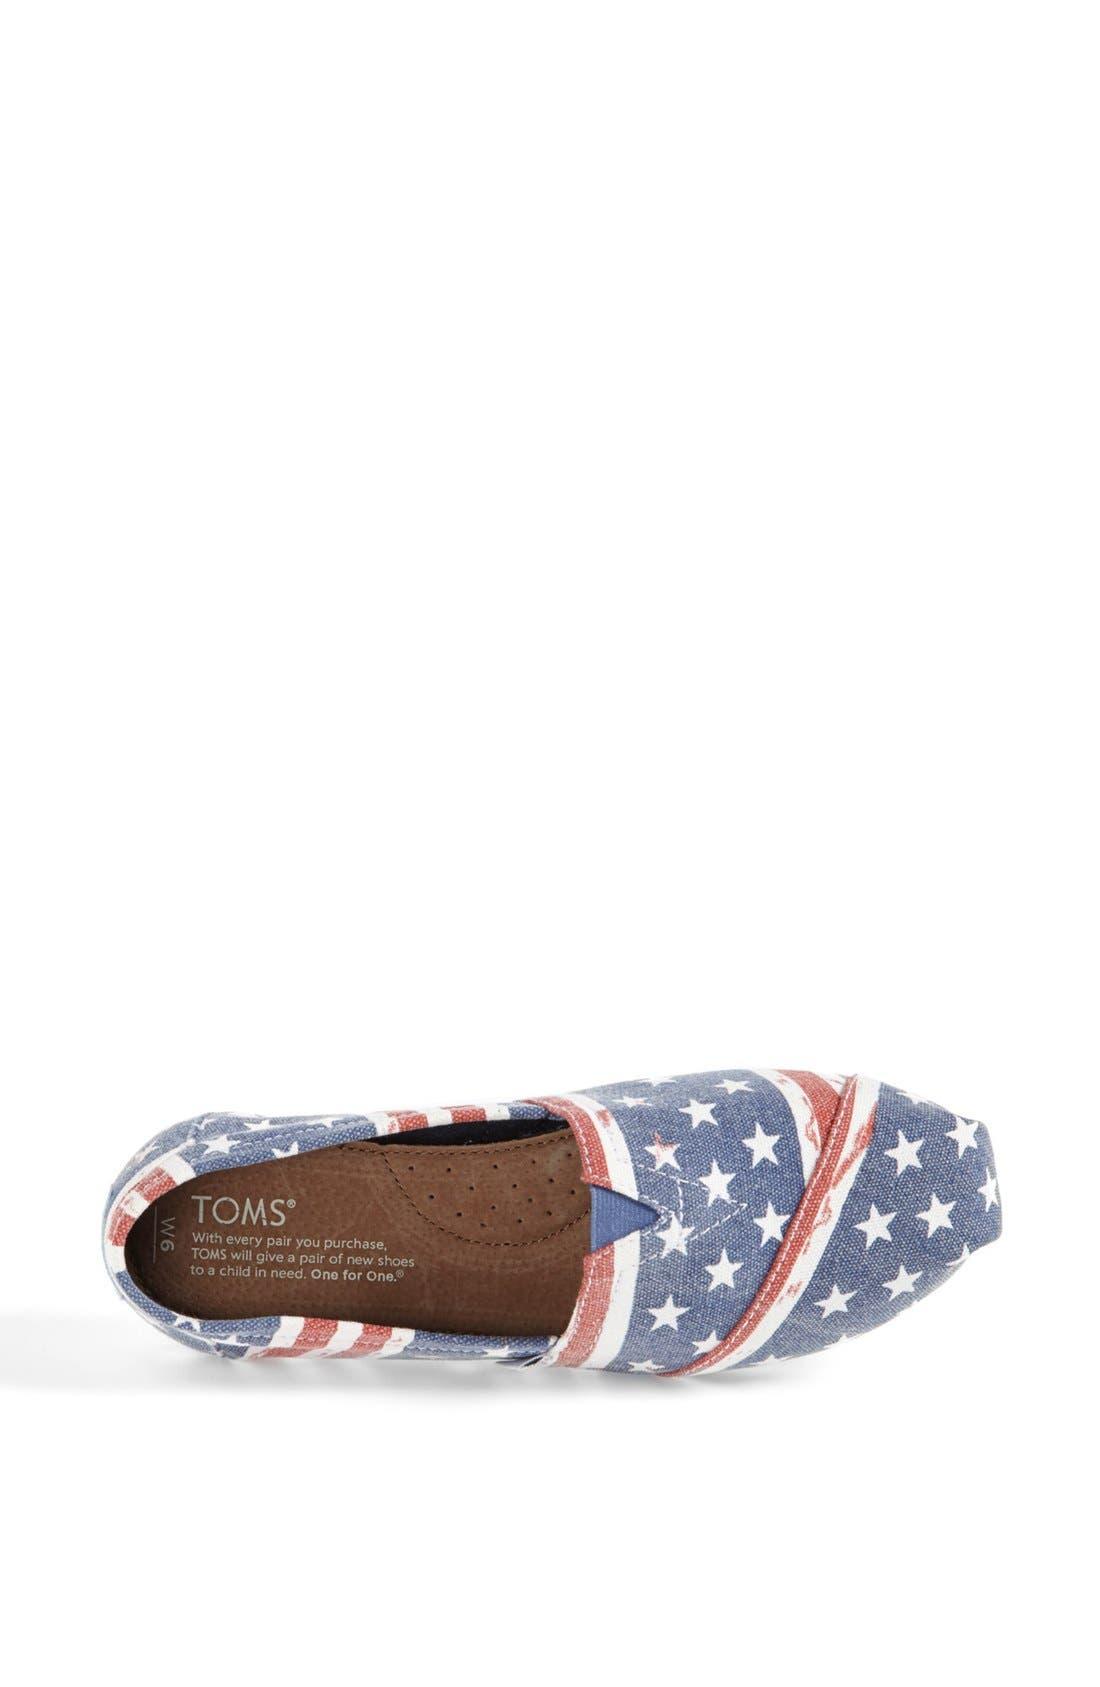 Alternate Image 3  - TOMS 'Classic - American' Slip-On (Women)